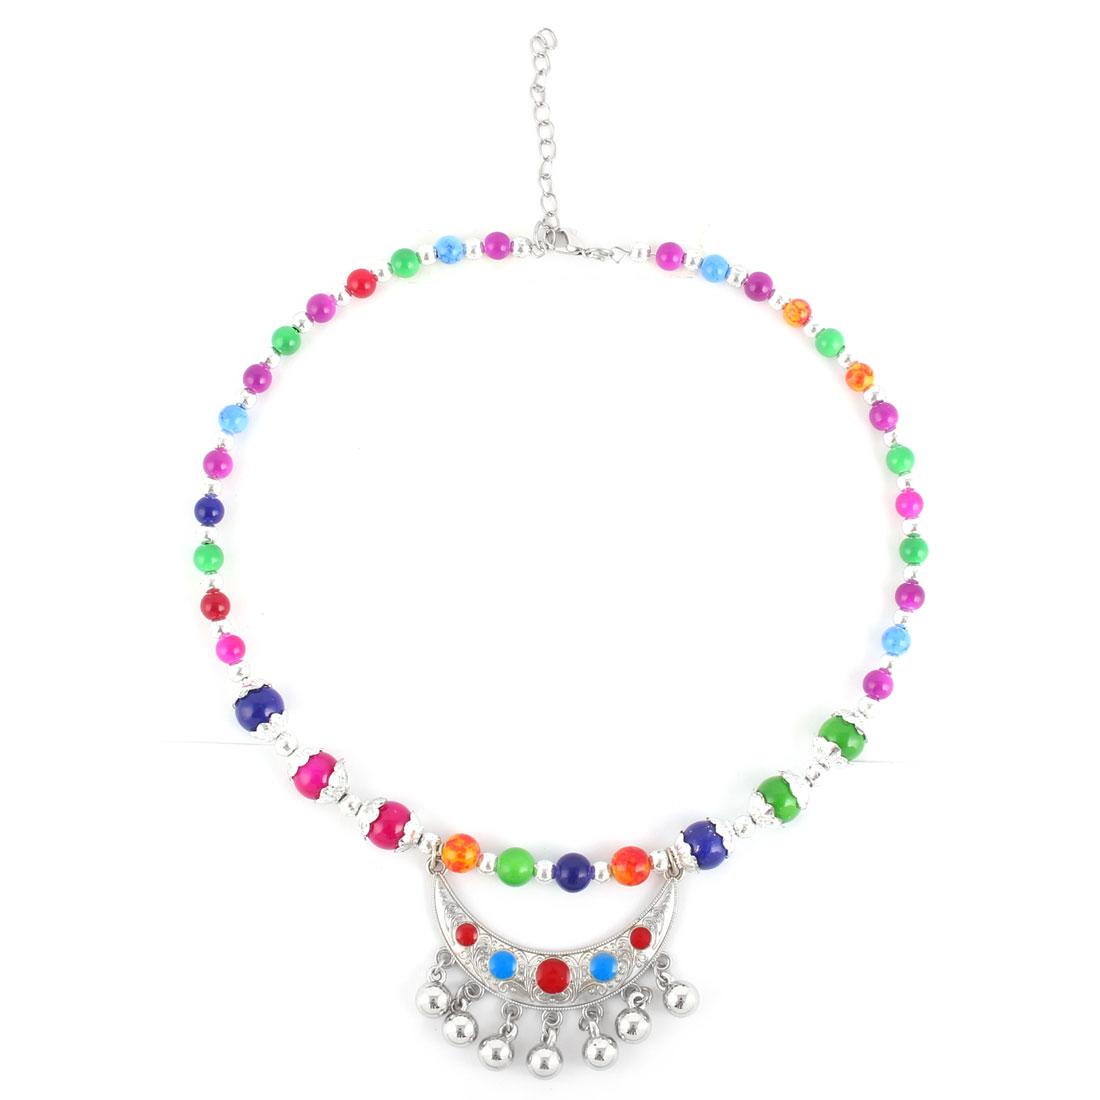 Festival Ladies Plastic Bead Moon Shaped Pendant Ethnic Style Necklet Necklace